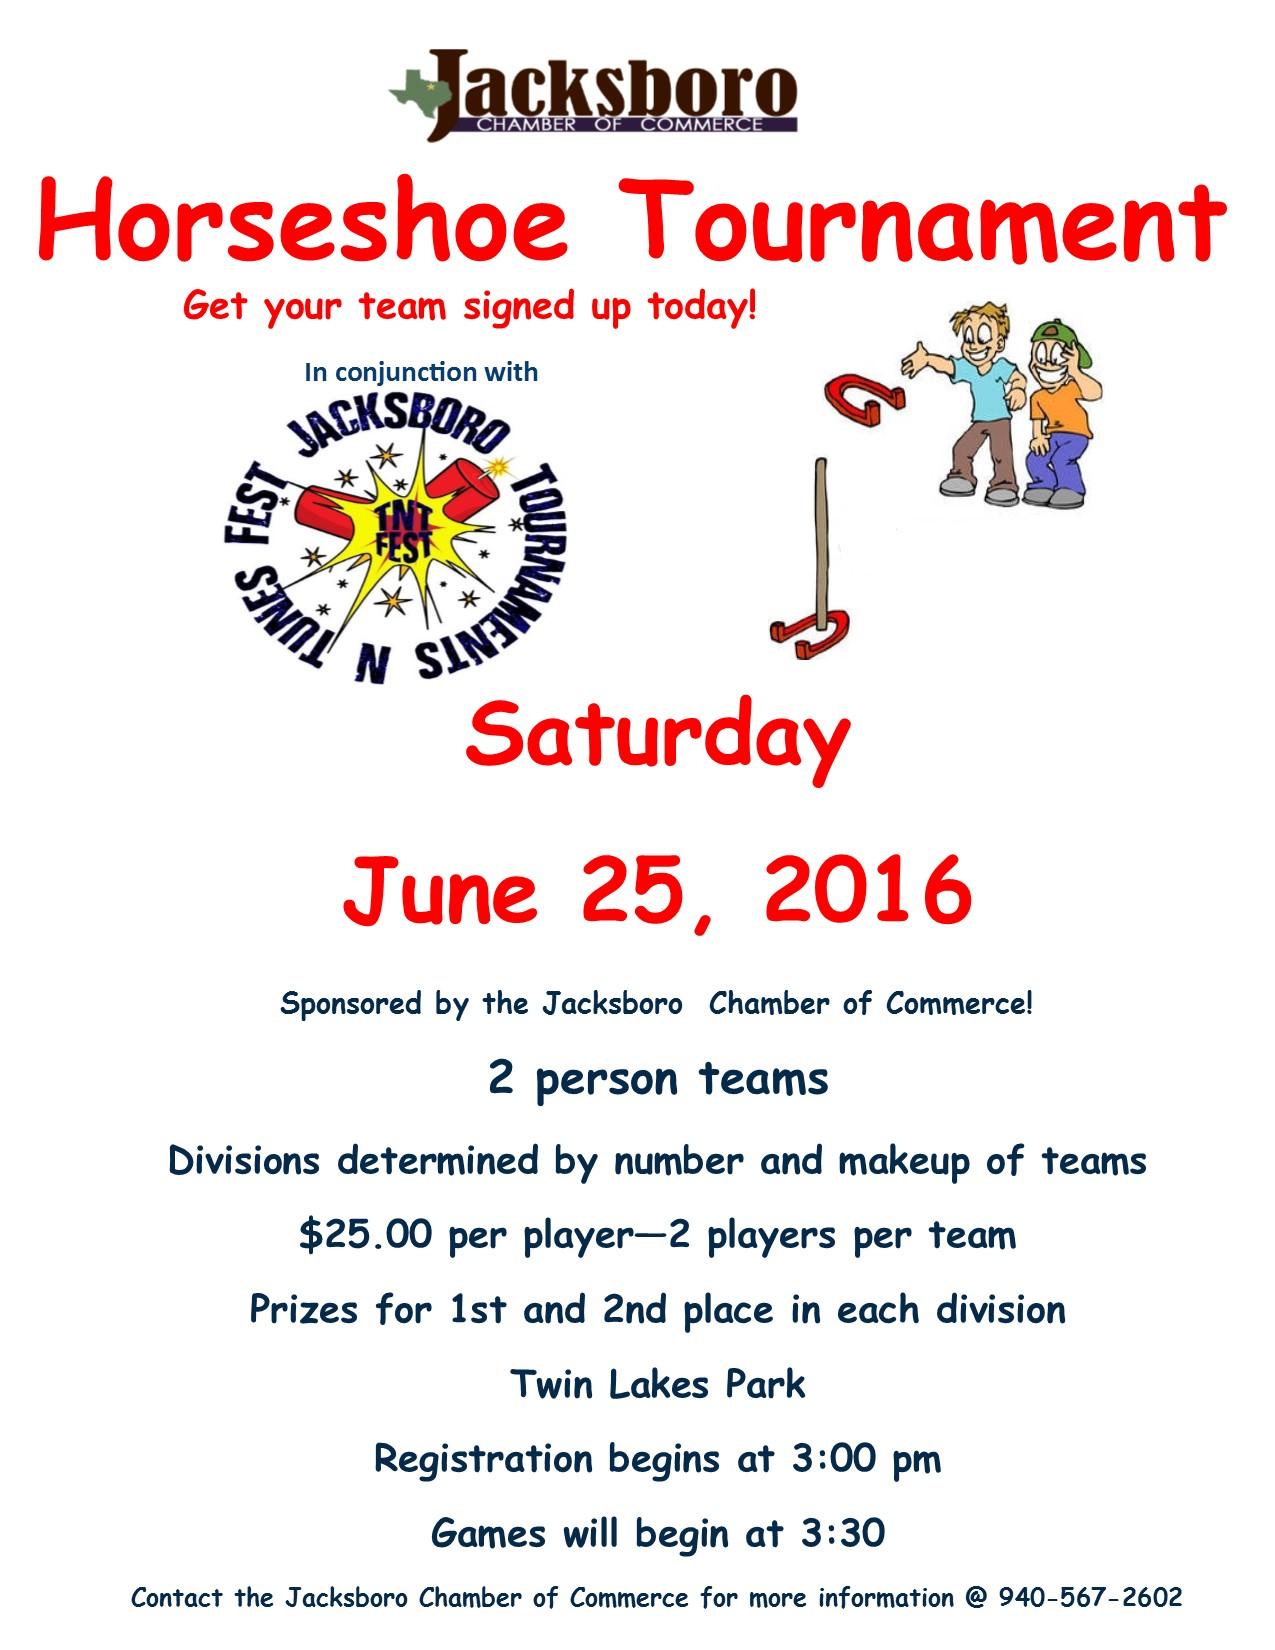 Horseshoe-Tournament-Flyer.jpg